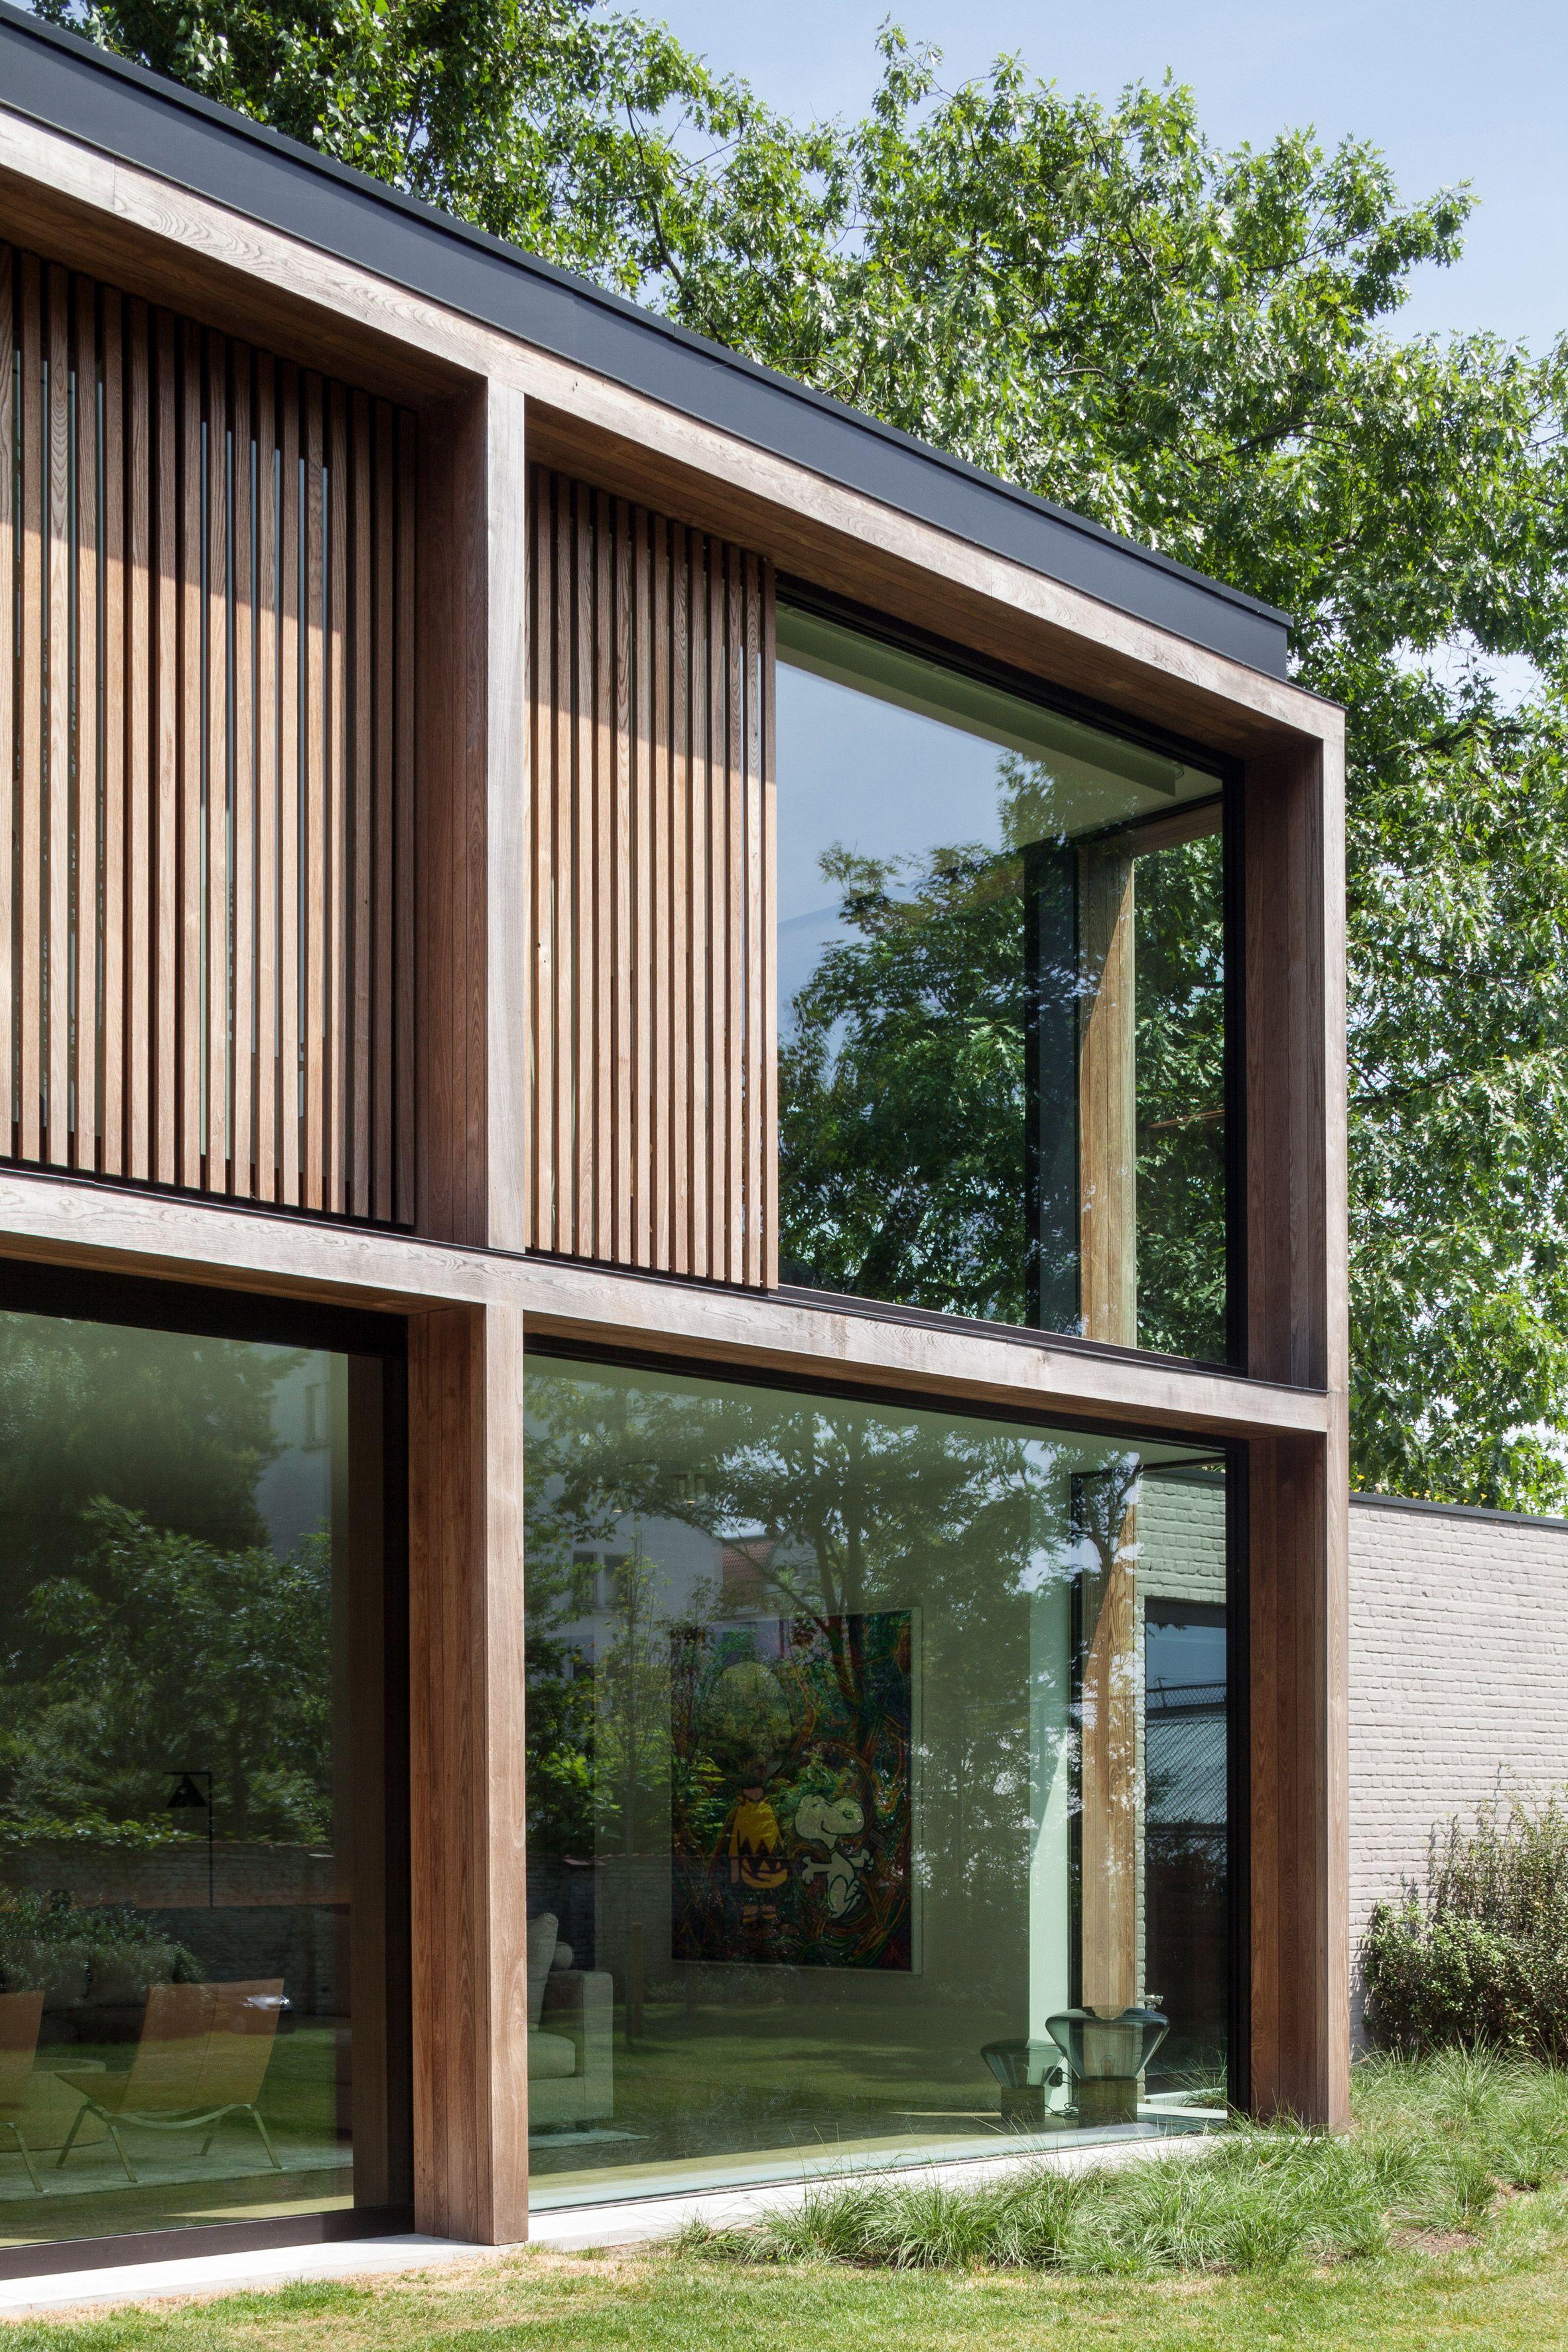 Light Filled Contemporary Living Rooms: Steven Vandenborre Creates Light-filled Extension For